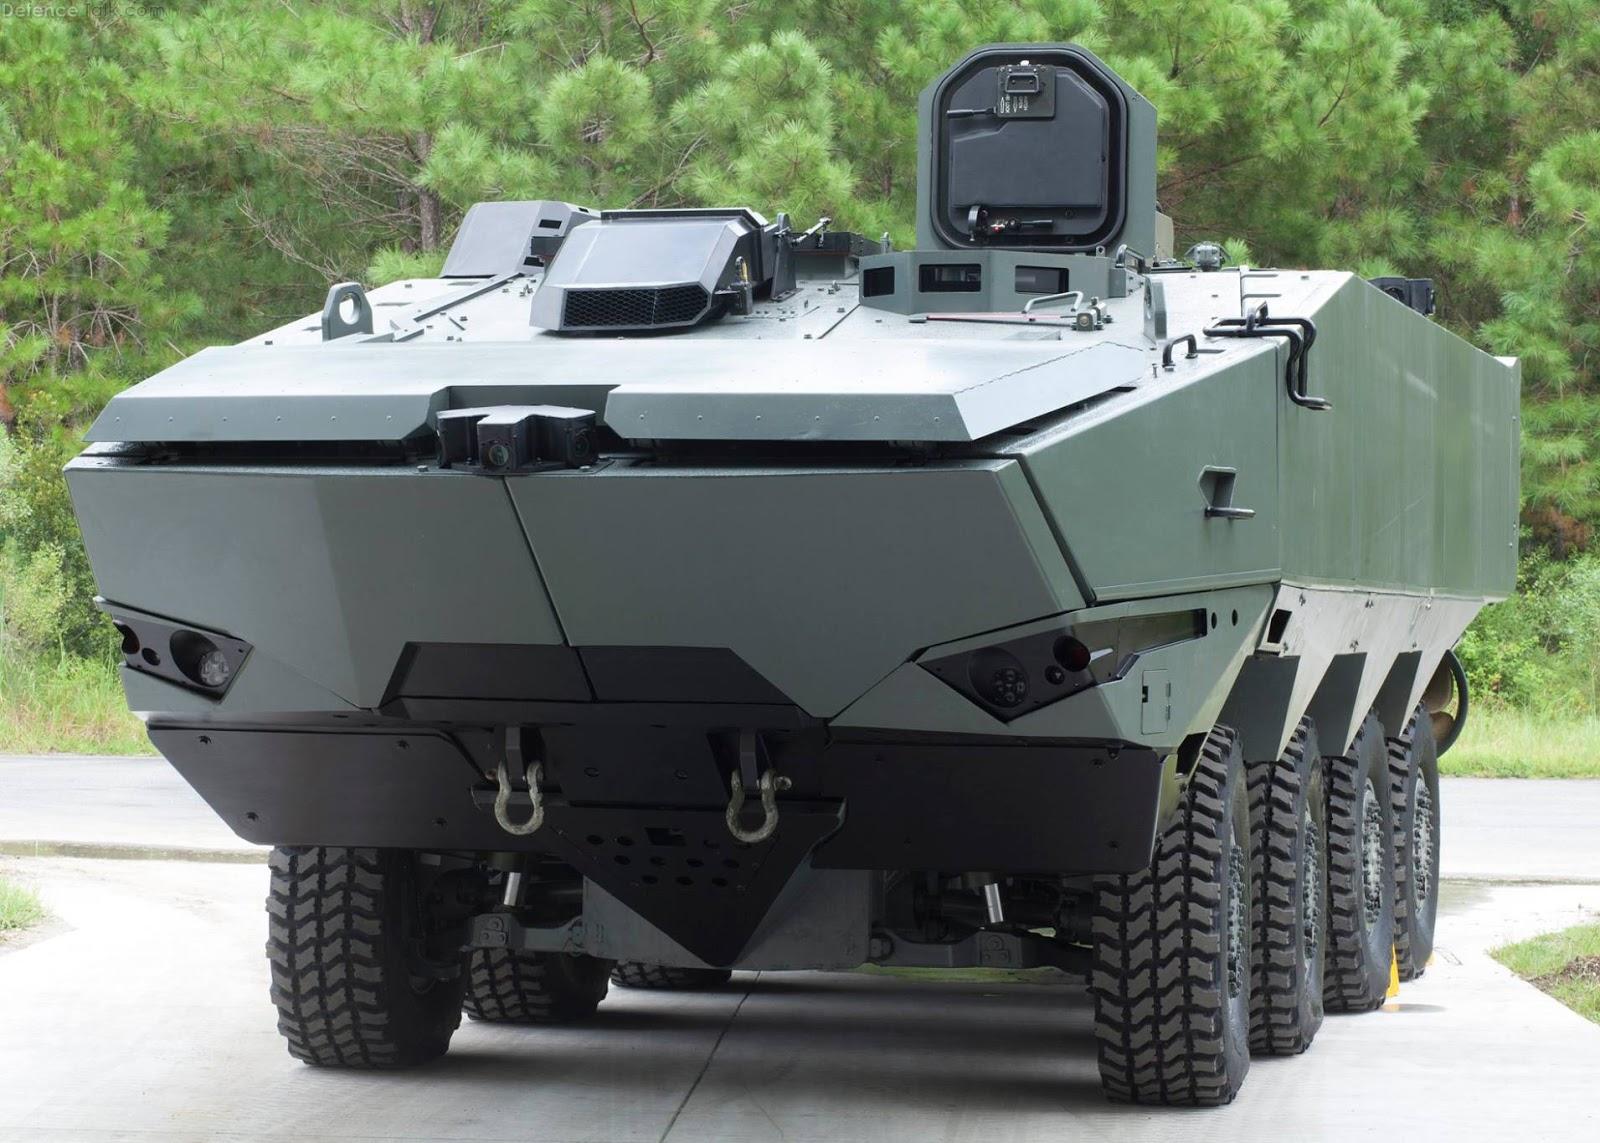 Terrex 2 Wheeled Armoured Vehicle